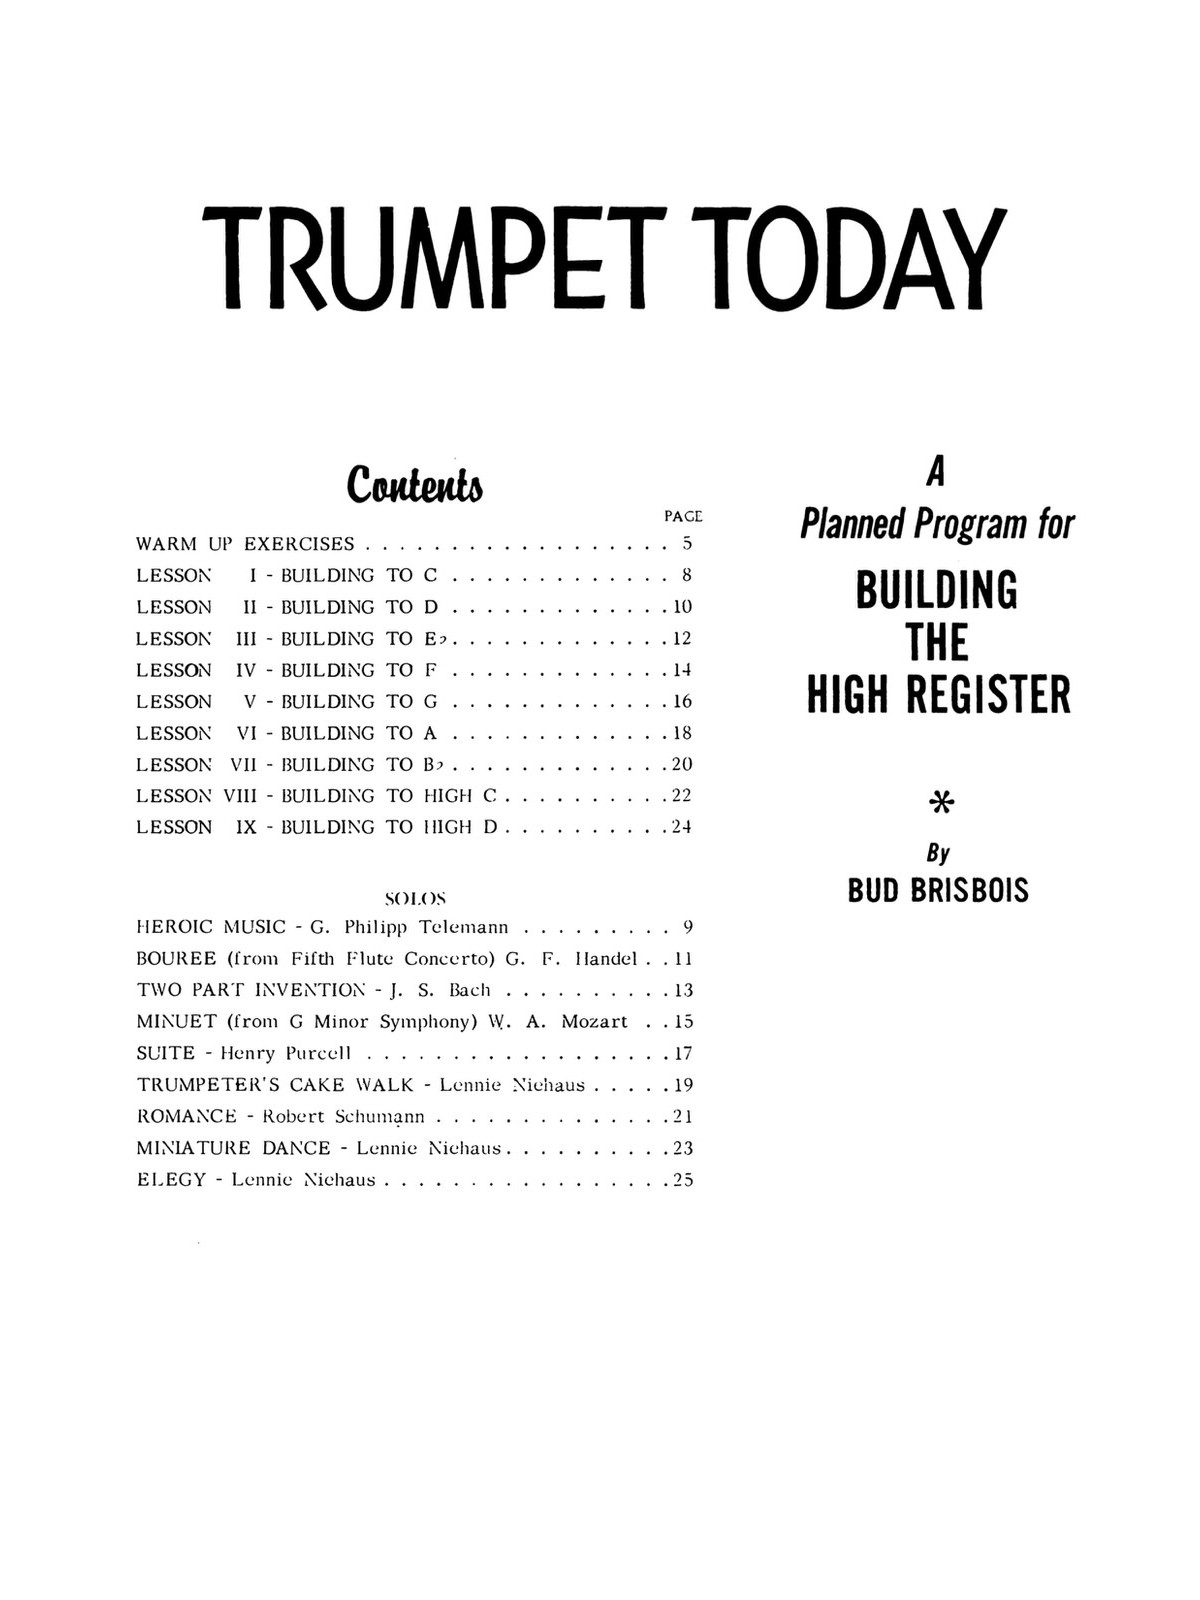 Brisbois, Trumpet Today, Building the Upper Register 2